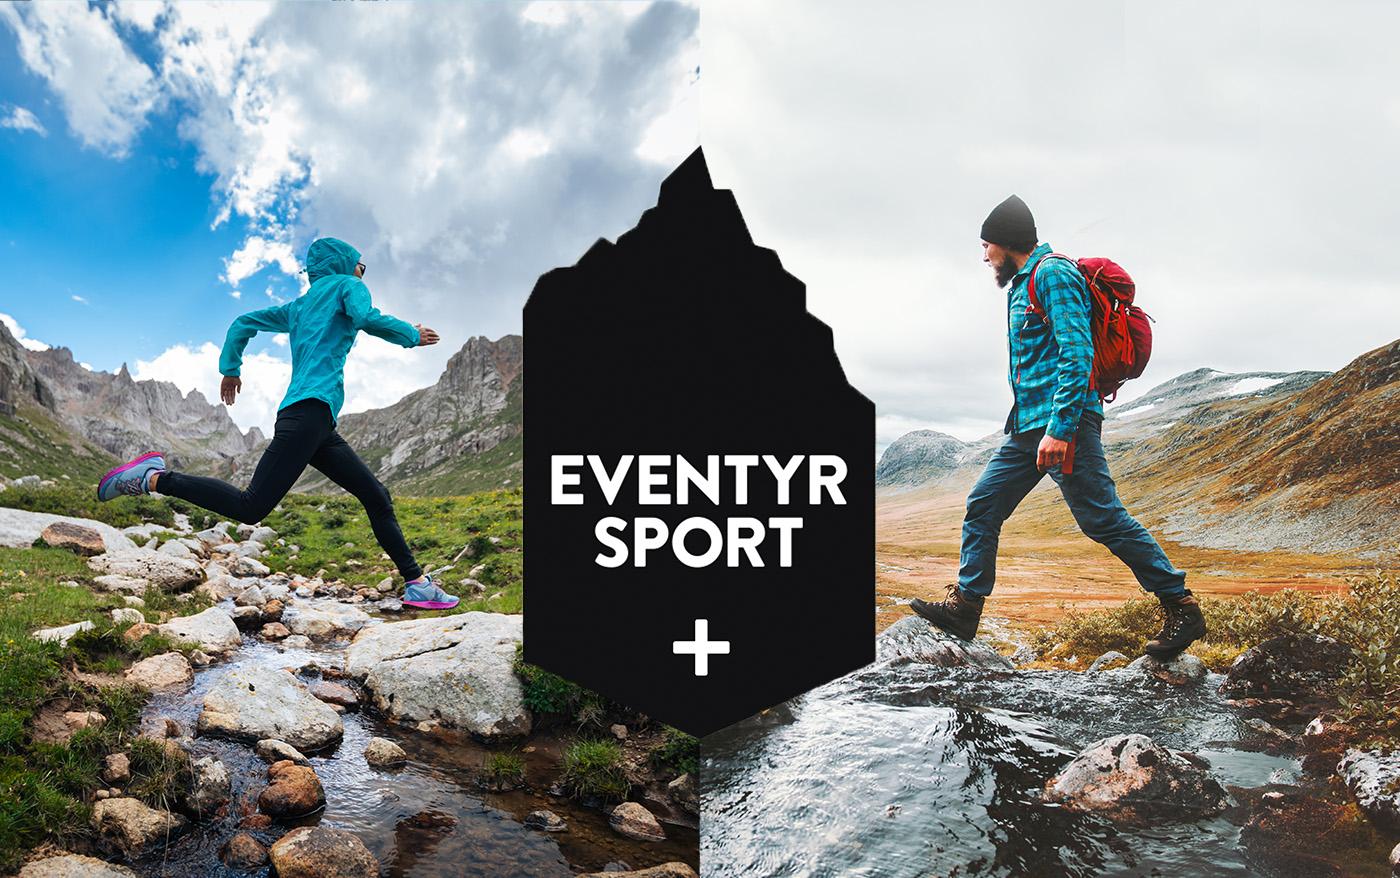 Eventyrsport og Racingdenmark - en helt naturlig fusion